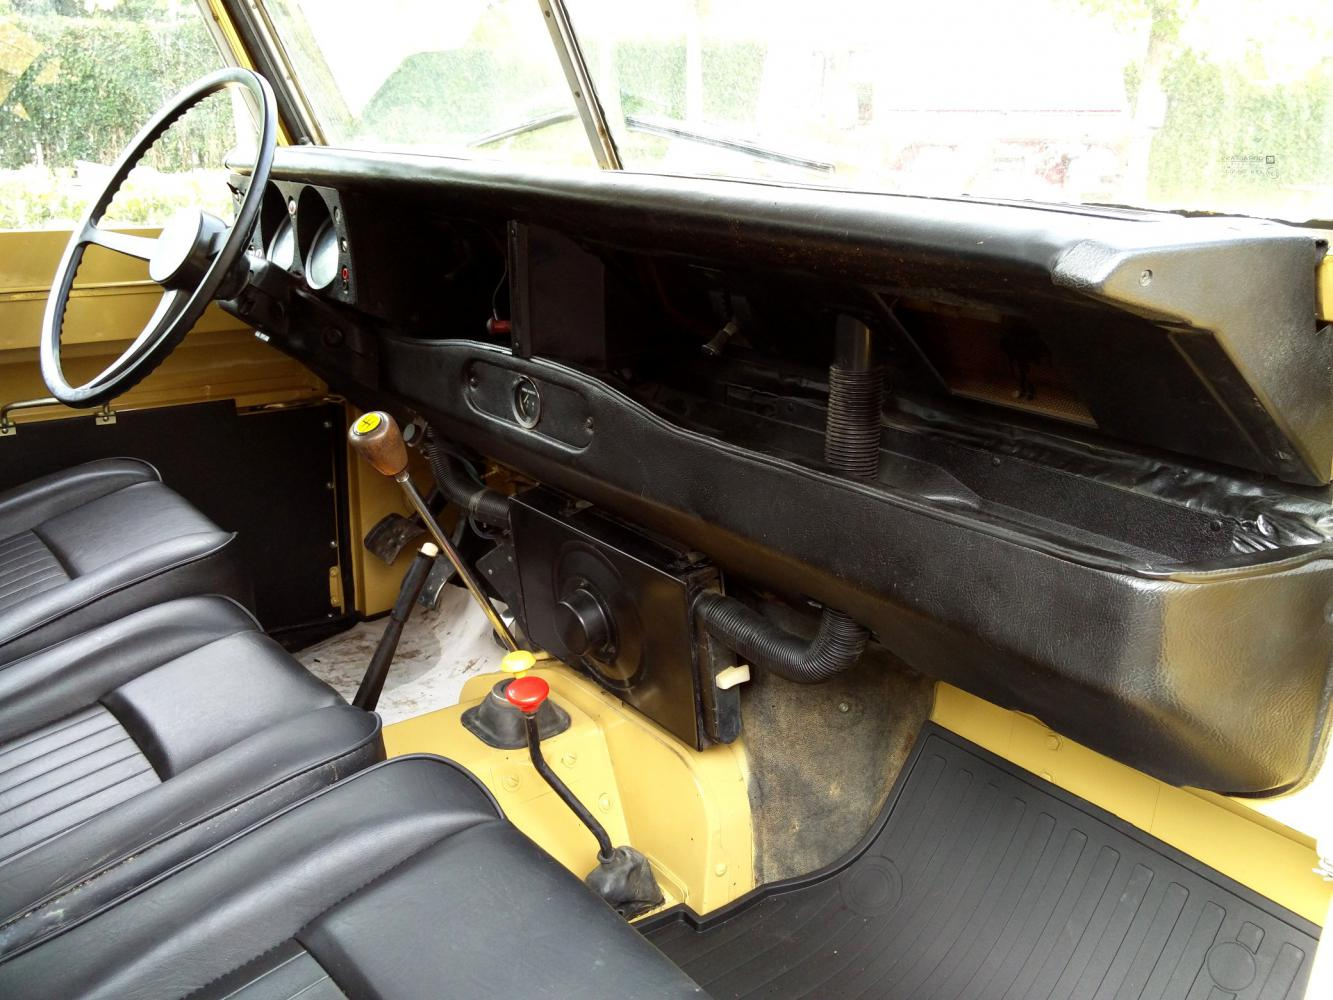 Click image for larger version  Name:1978 LR LHD Santana 88 Hardtop A Mustard Yellow dash and trim.jpg Views:67 Size:167.4 KB ID:296593